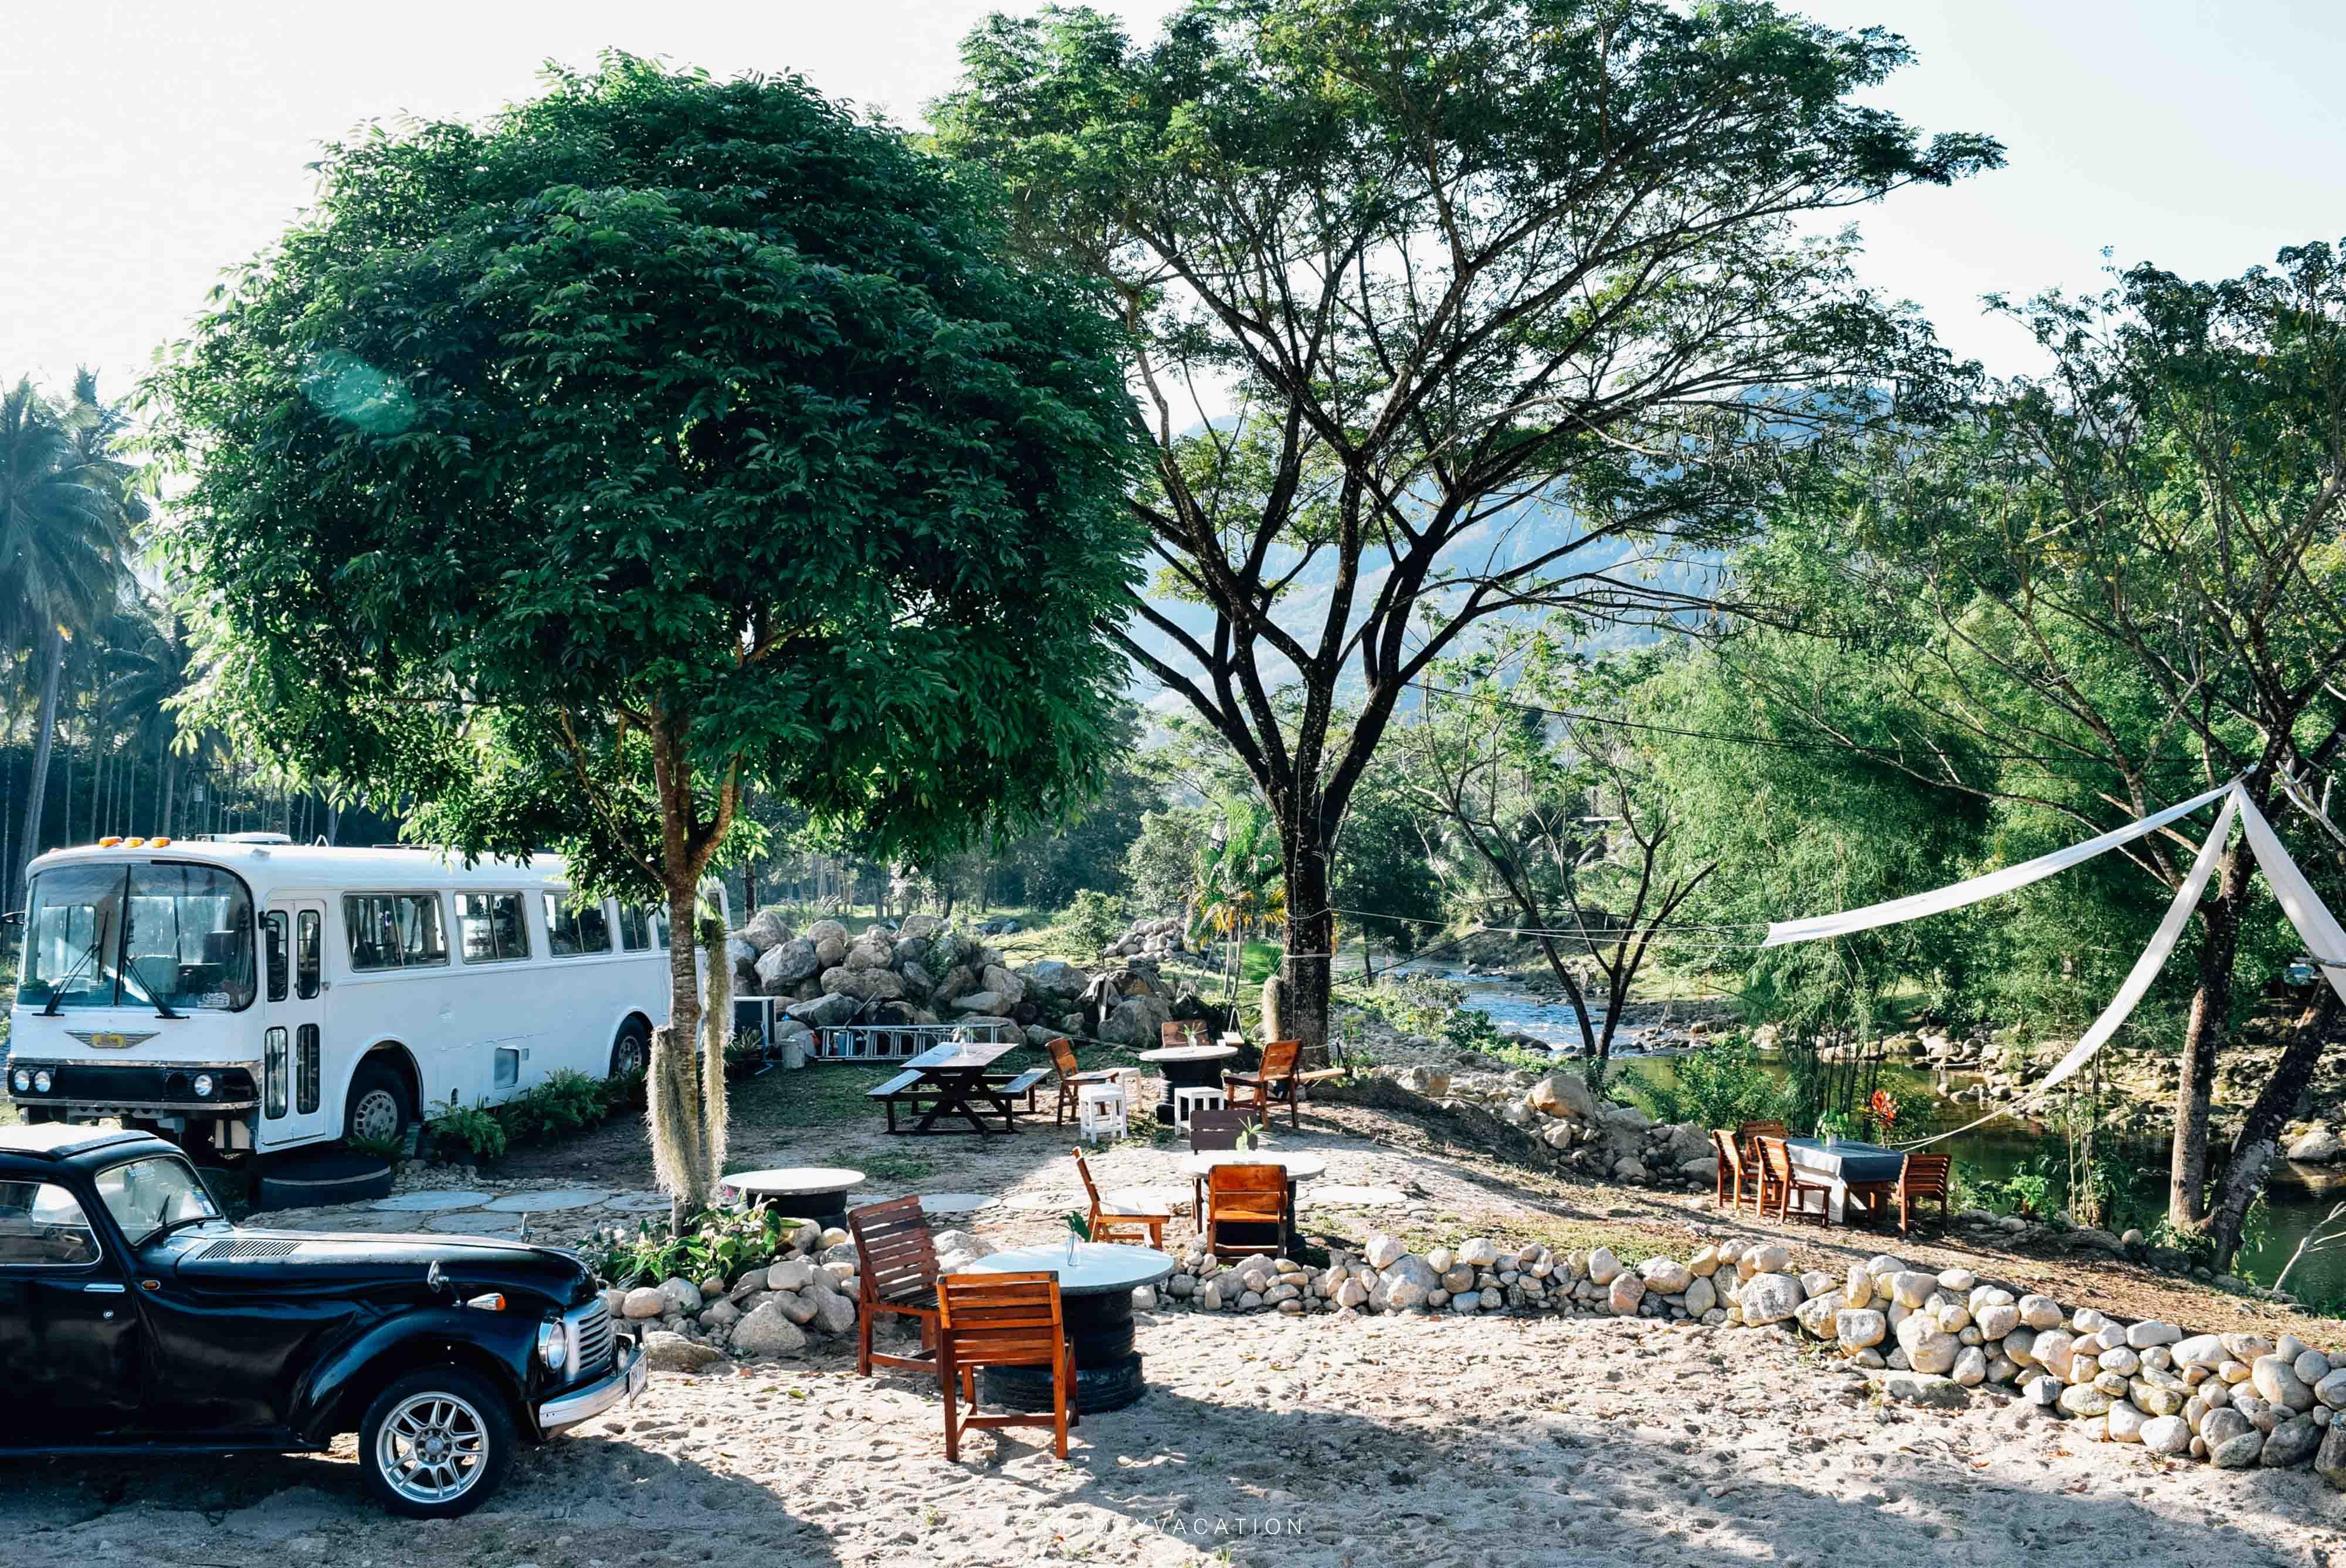 Bus cafe ช้างกลาง นครศรีดีย์